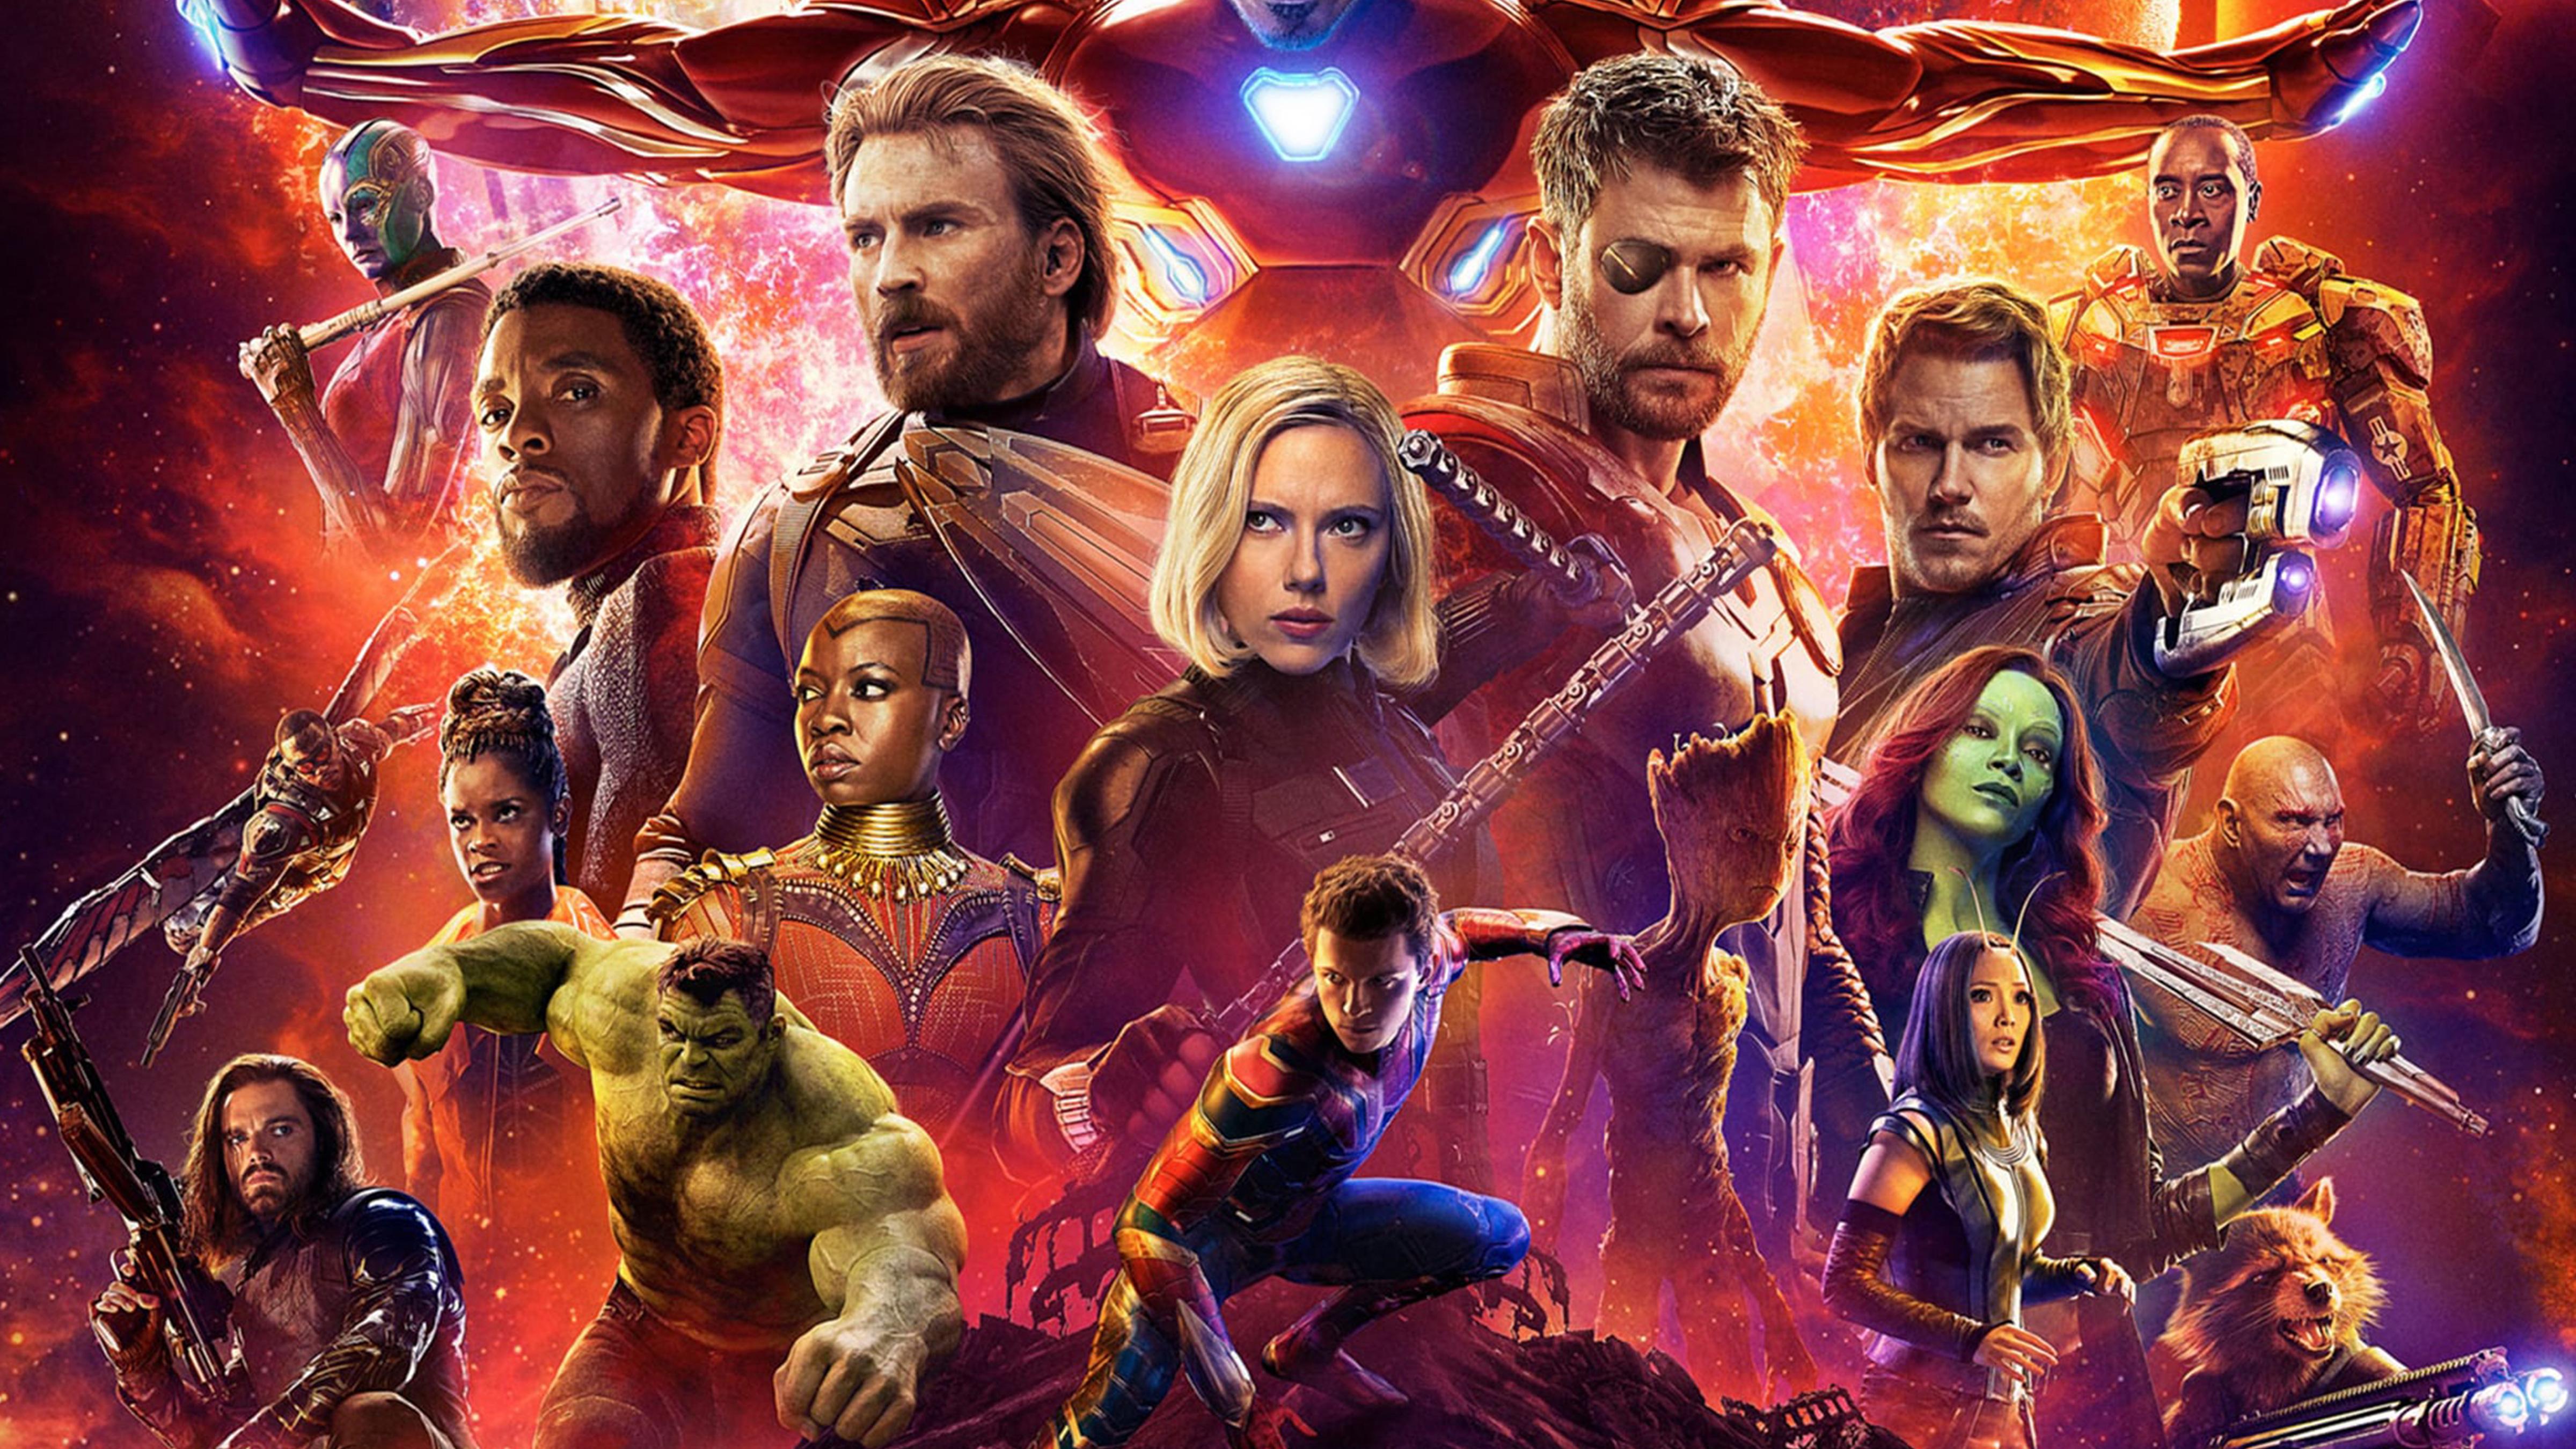 Avengers Infinity War Hd Movie Download In Tamilyogi Powermall